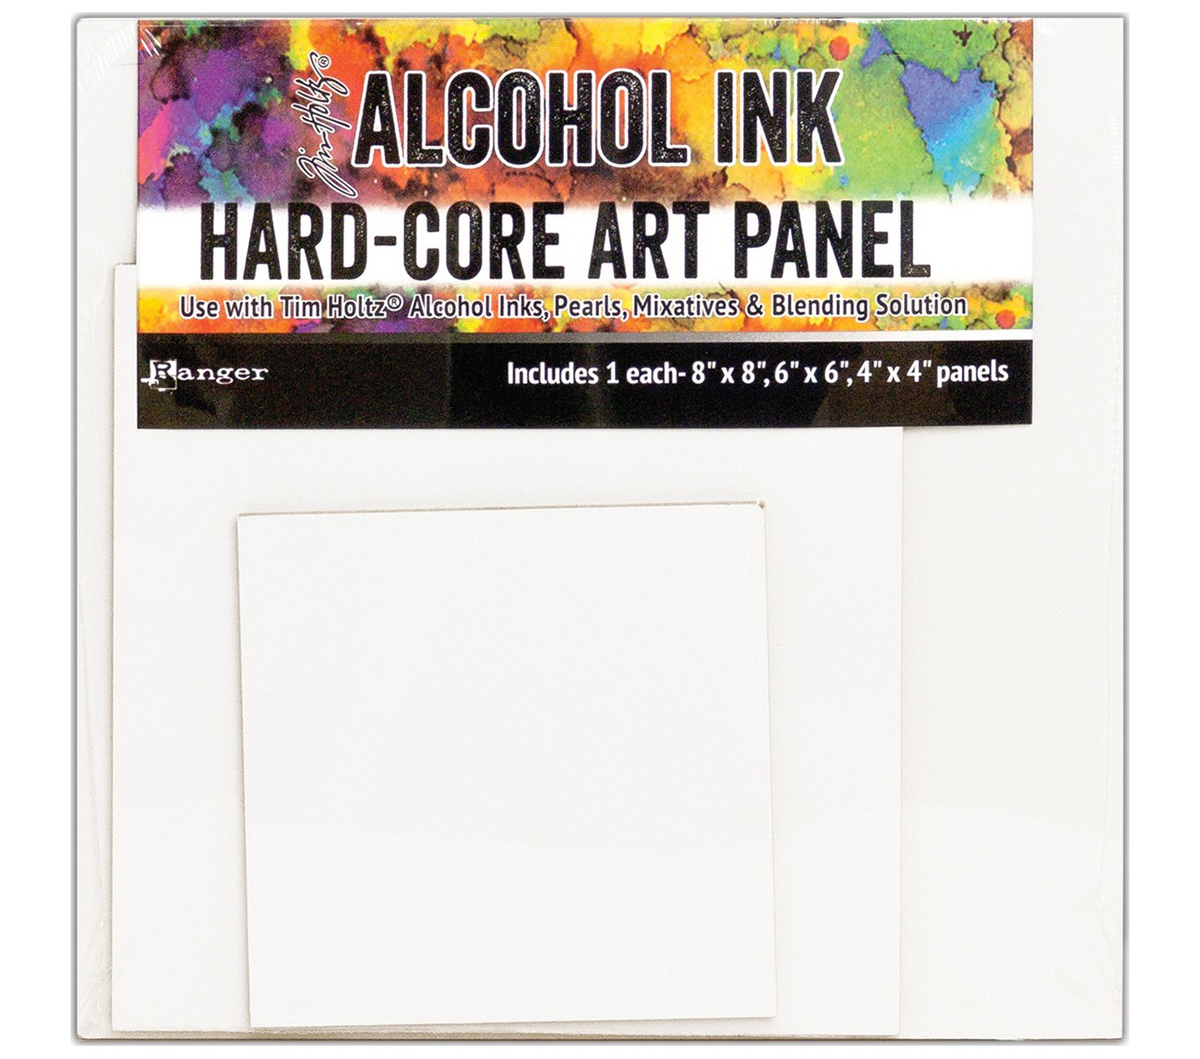 "Set of 3 Alcohol Ink Tim Holtz 4/"" x 4/"" Ranger Hard-Core Art Panels"